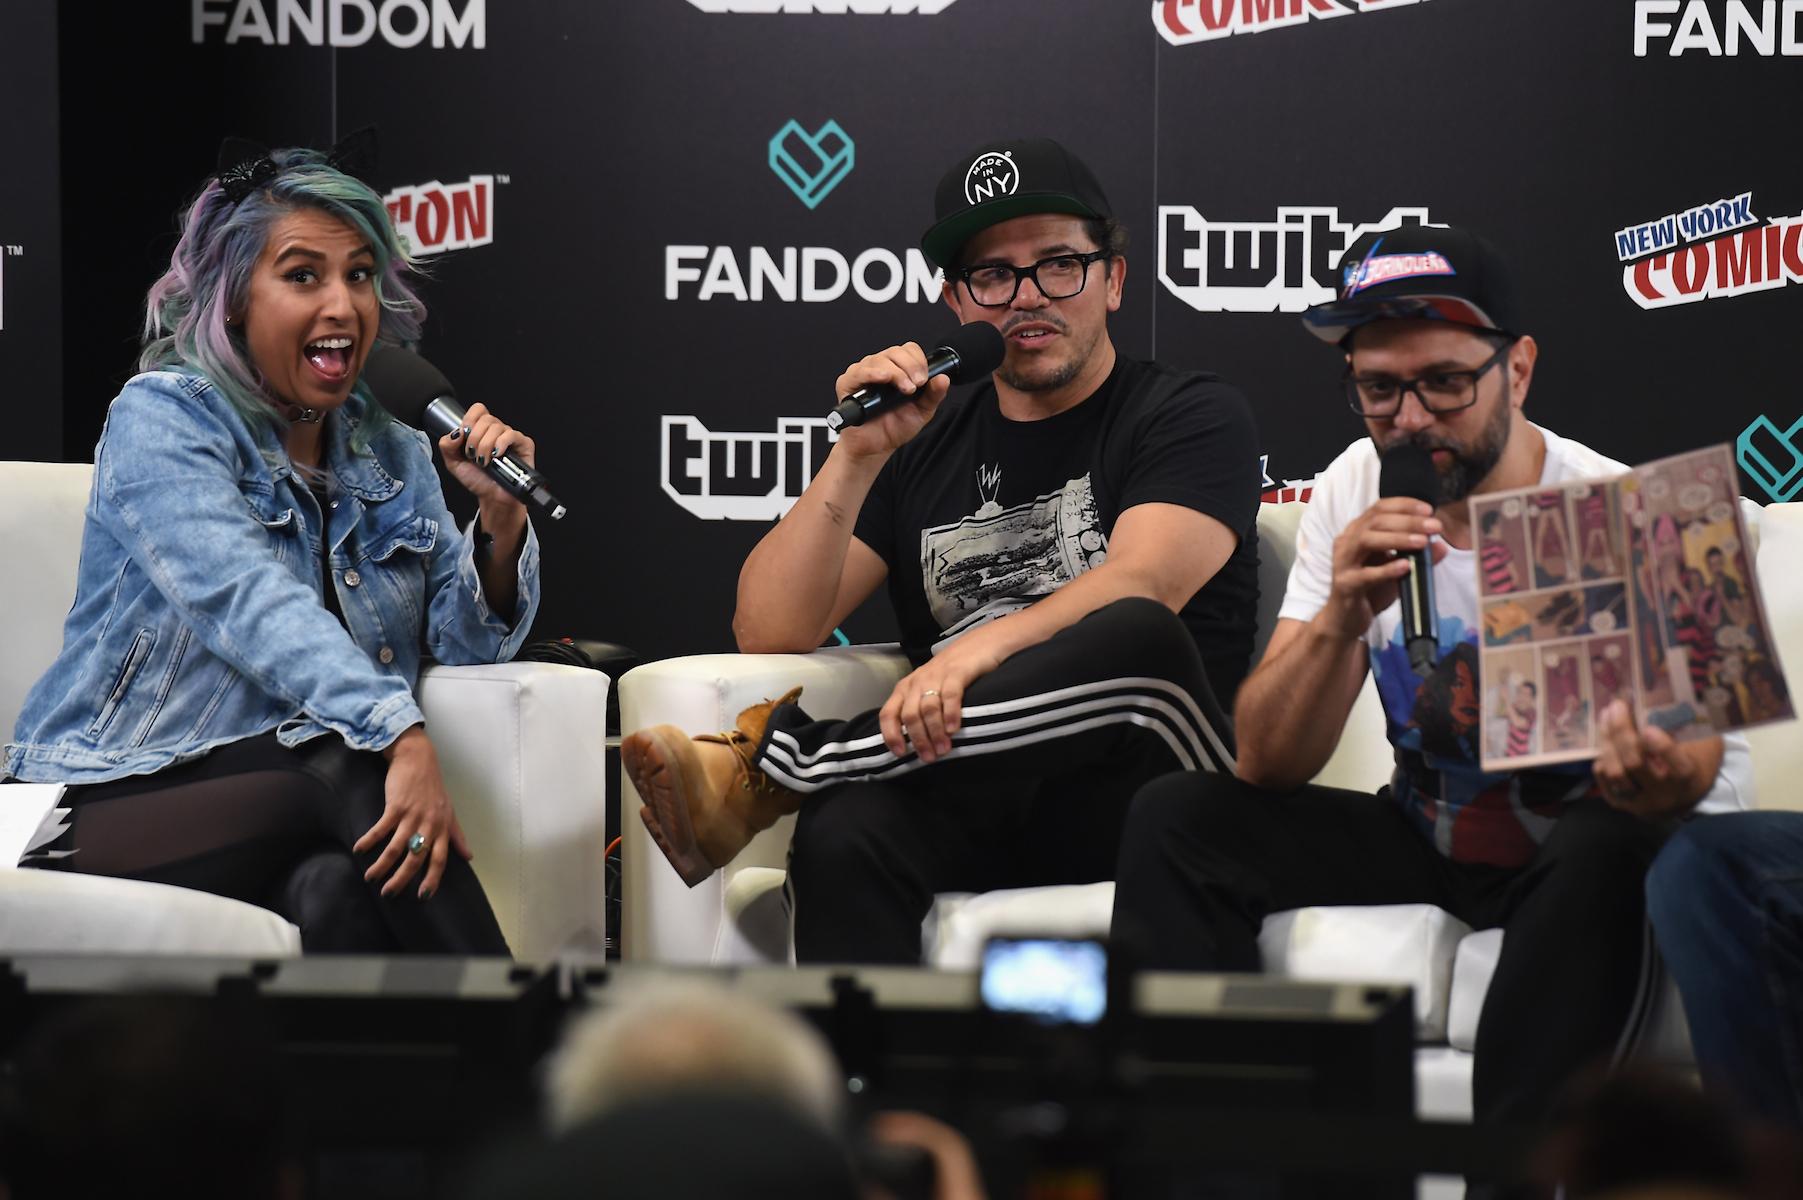 Edgardo Miranda-Rodriguez Turned John Leguizamo's One-Man Show 'Freak' Into a Comic Book